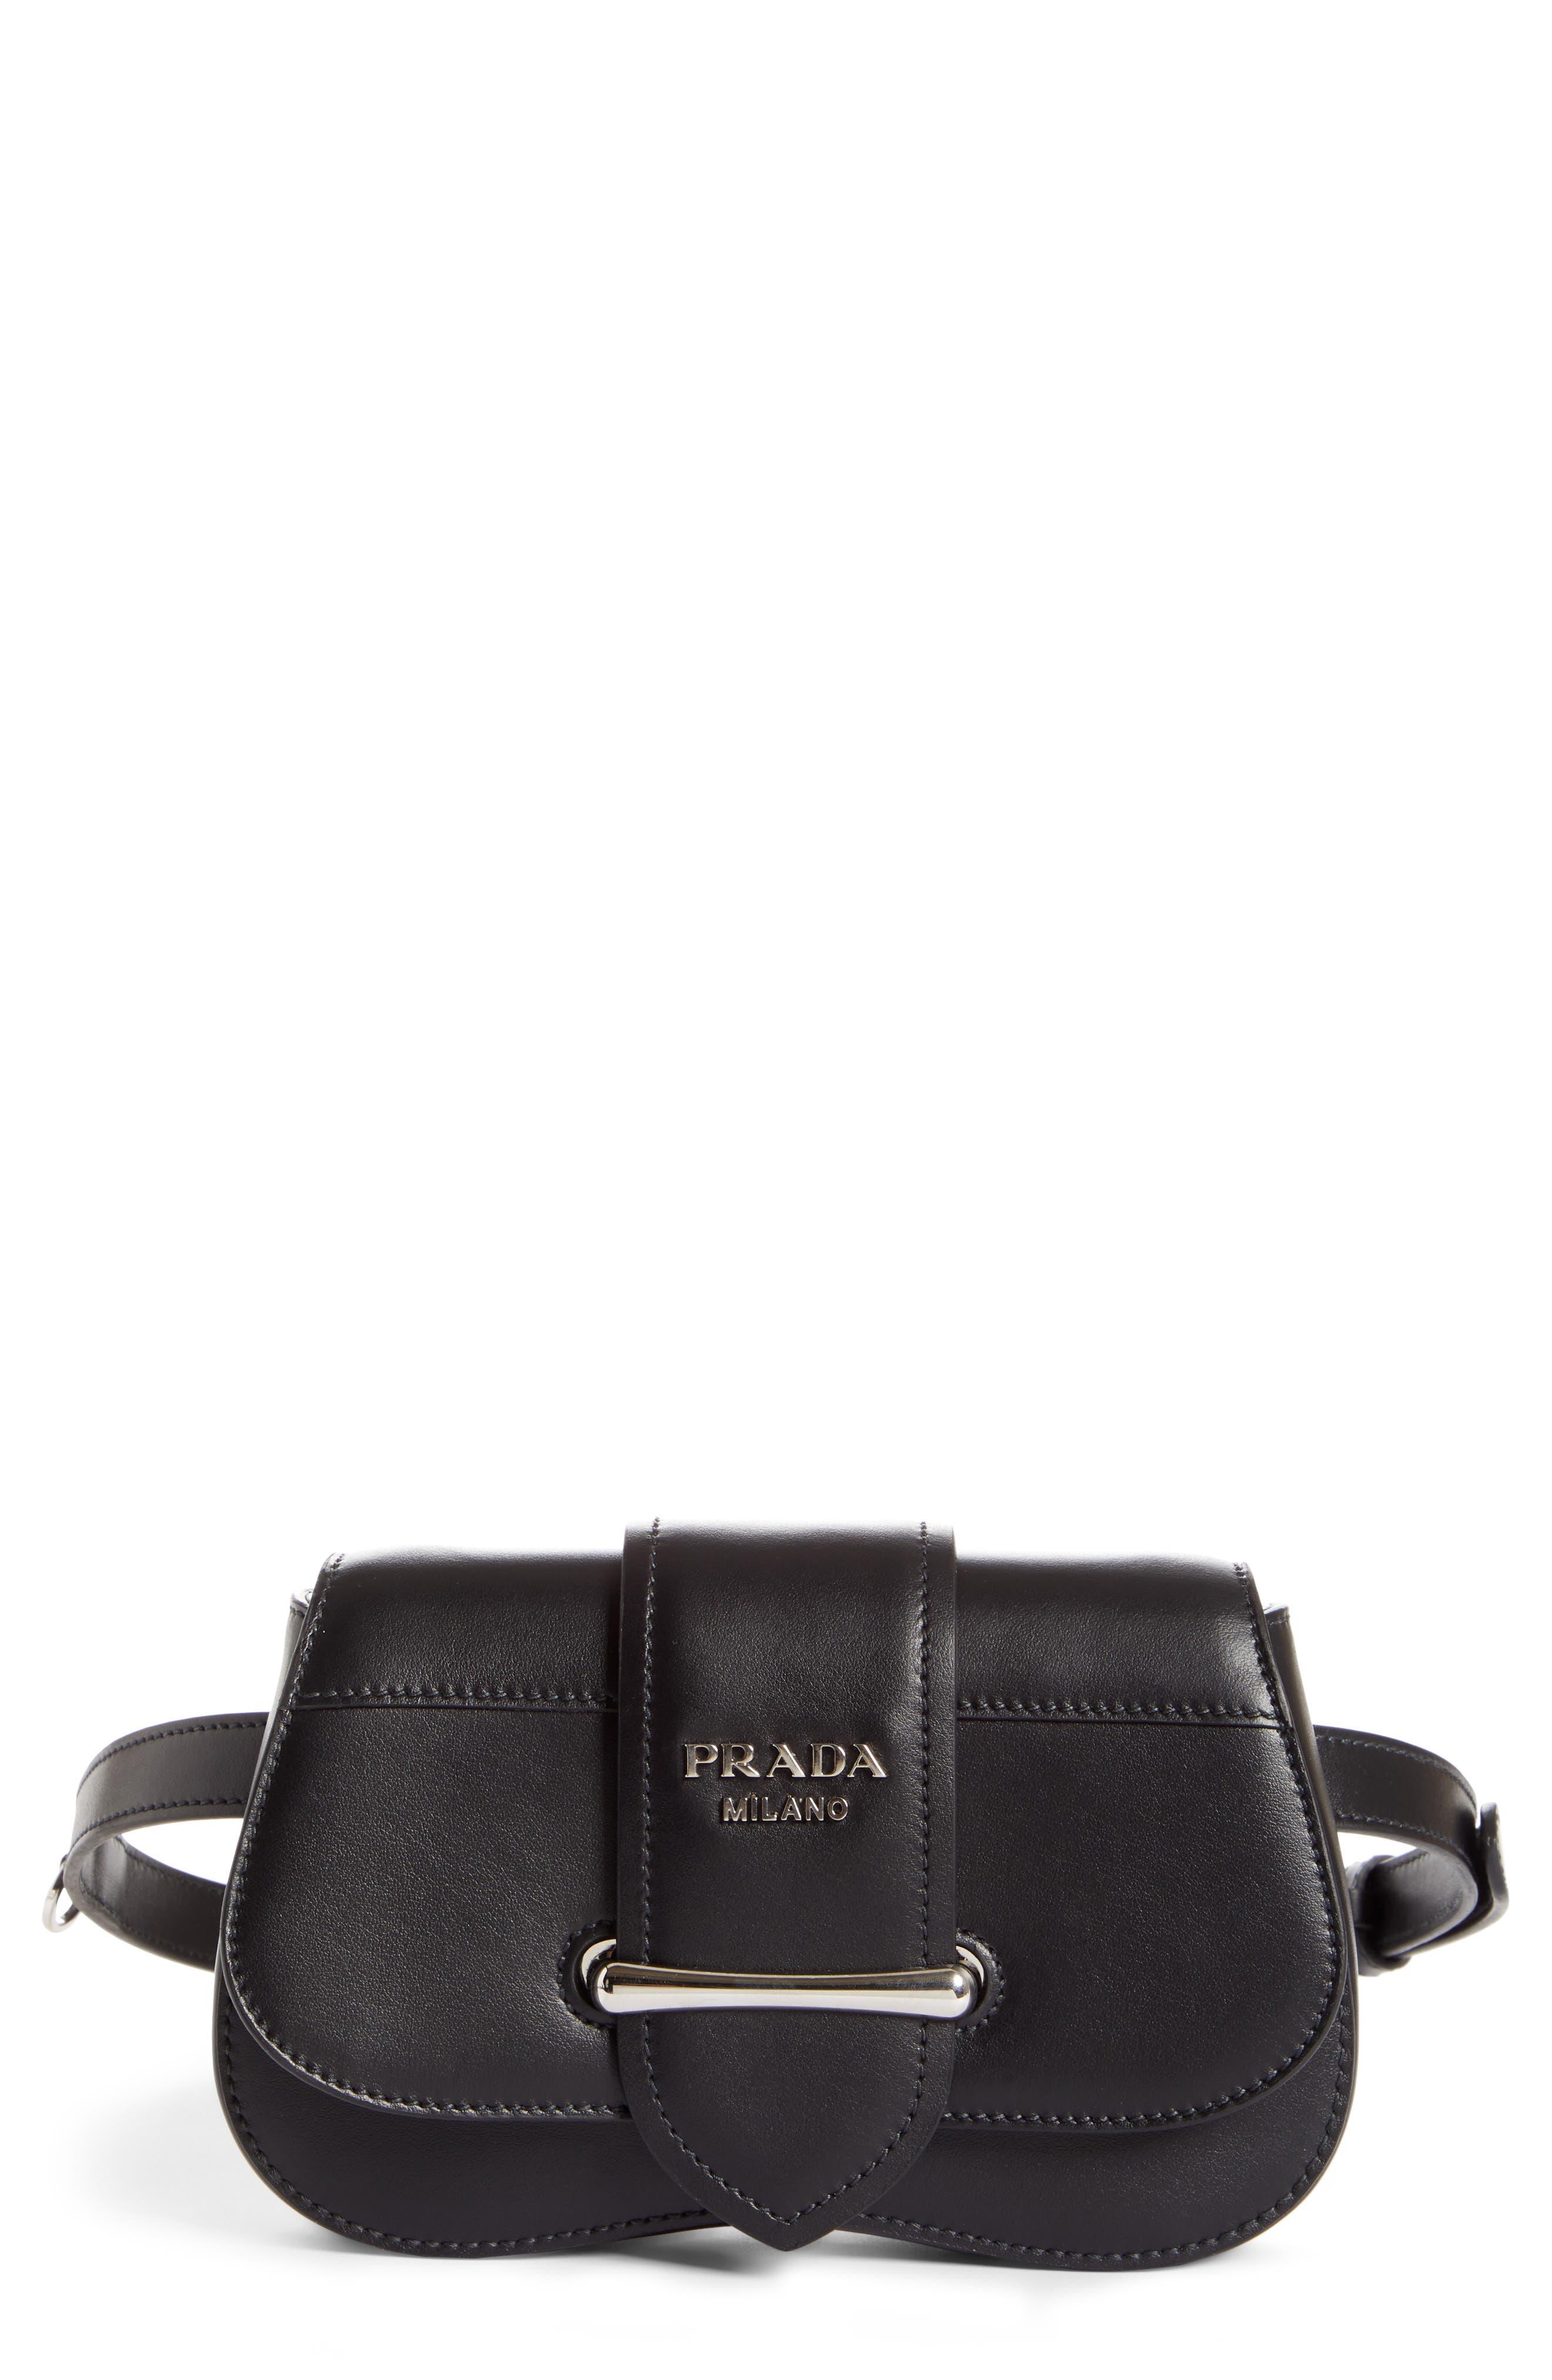 dd83f73fb43523 Belt Bags Prada: Shoes, Accessories & Fragrance   Nordstrom